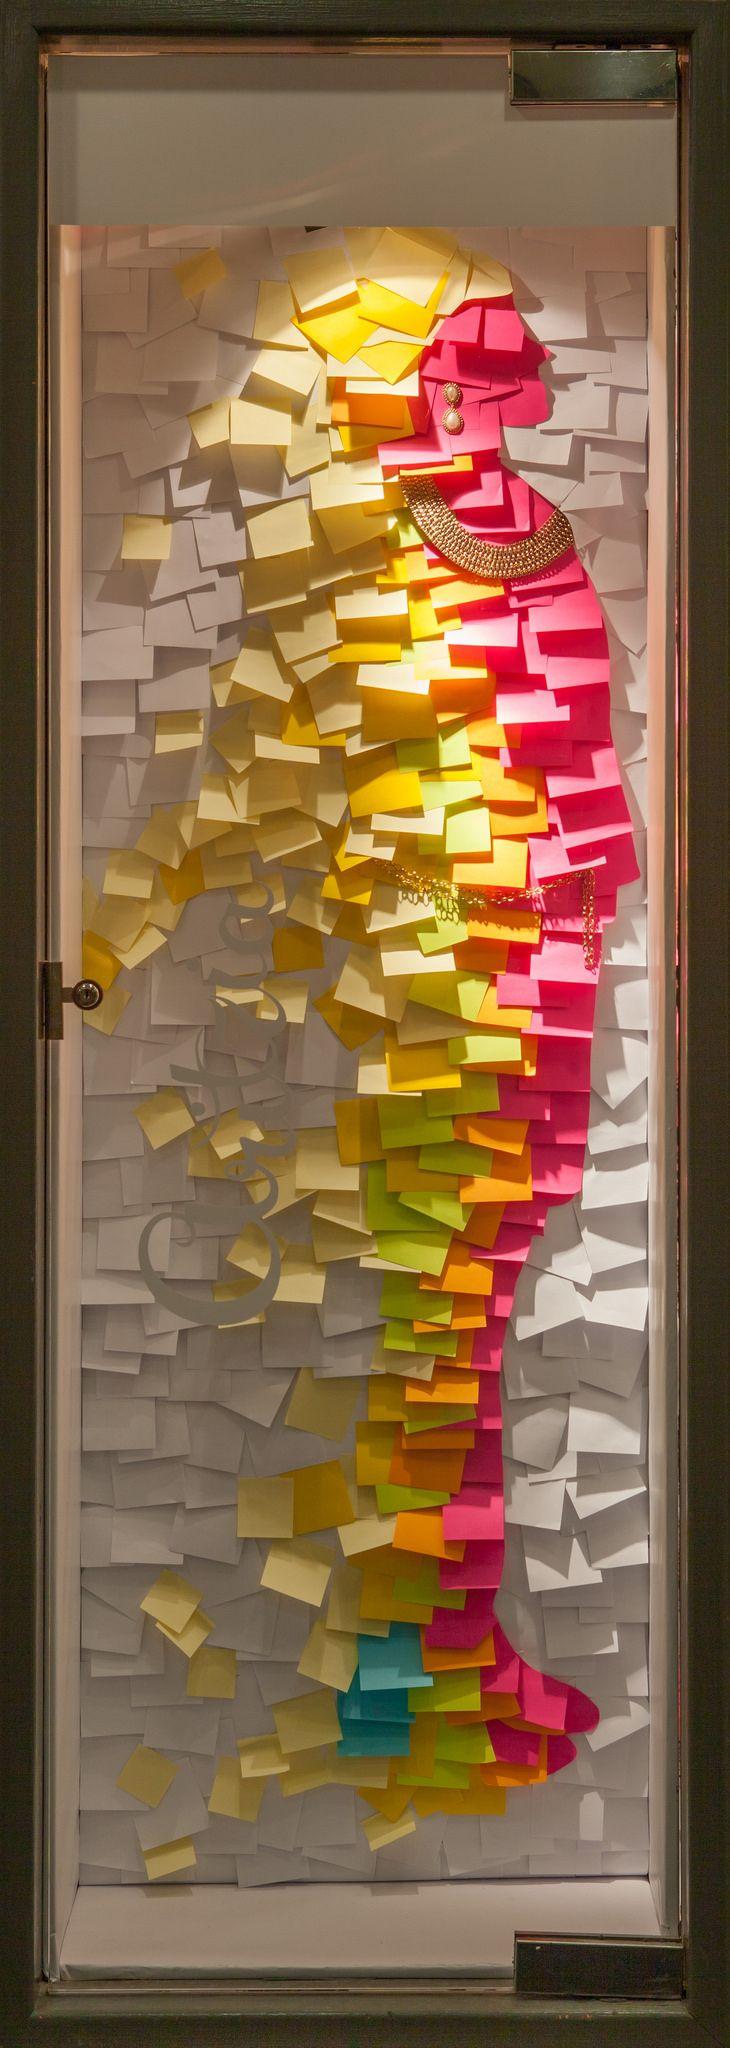 Flickr window display ideas pinterest schaufenster - Deko treppenaufgang ...